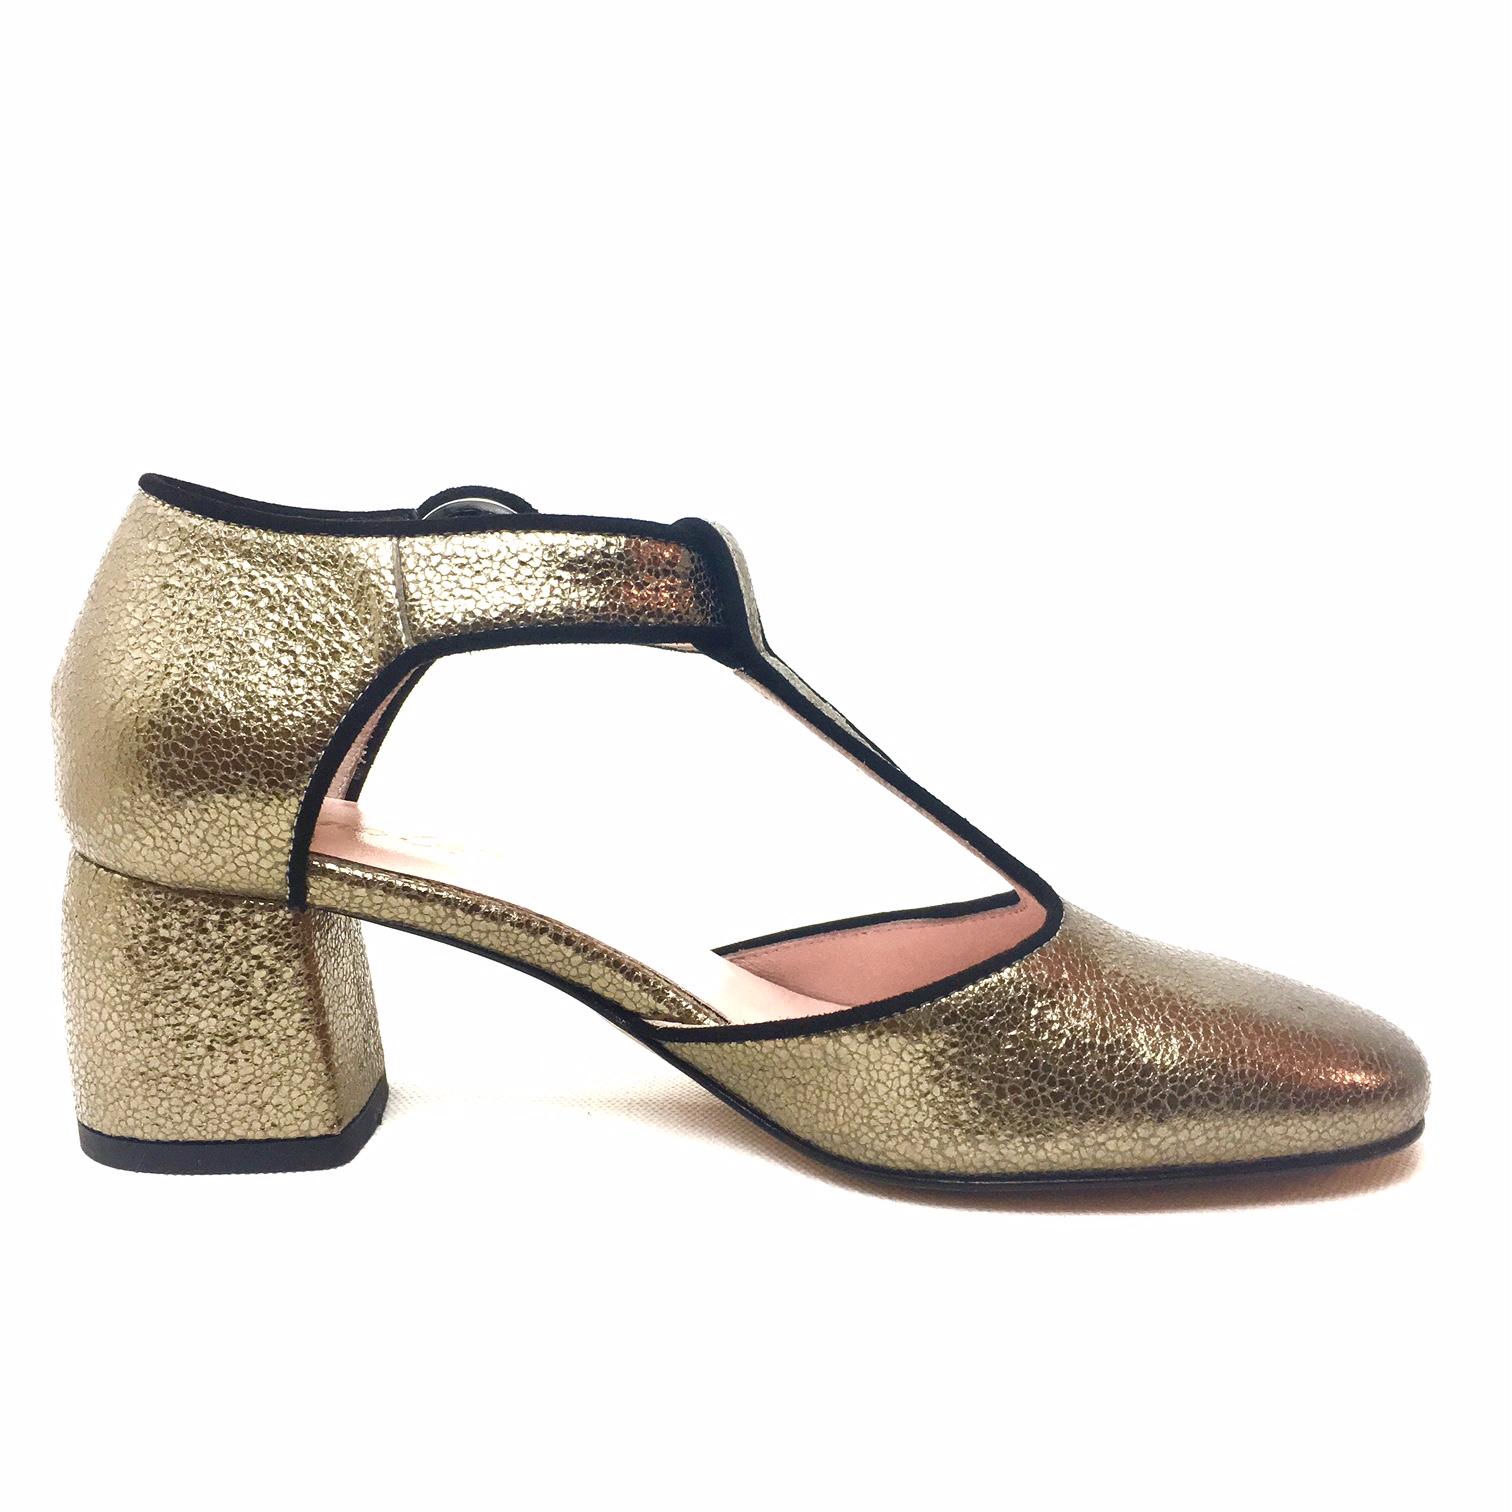 designer fashion 25e23 86f71 ANNA-F.8922-cristal-gold-3.jpg